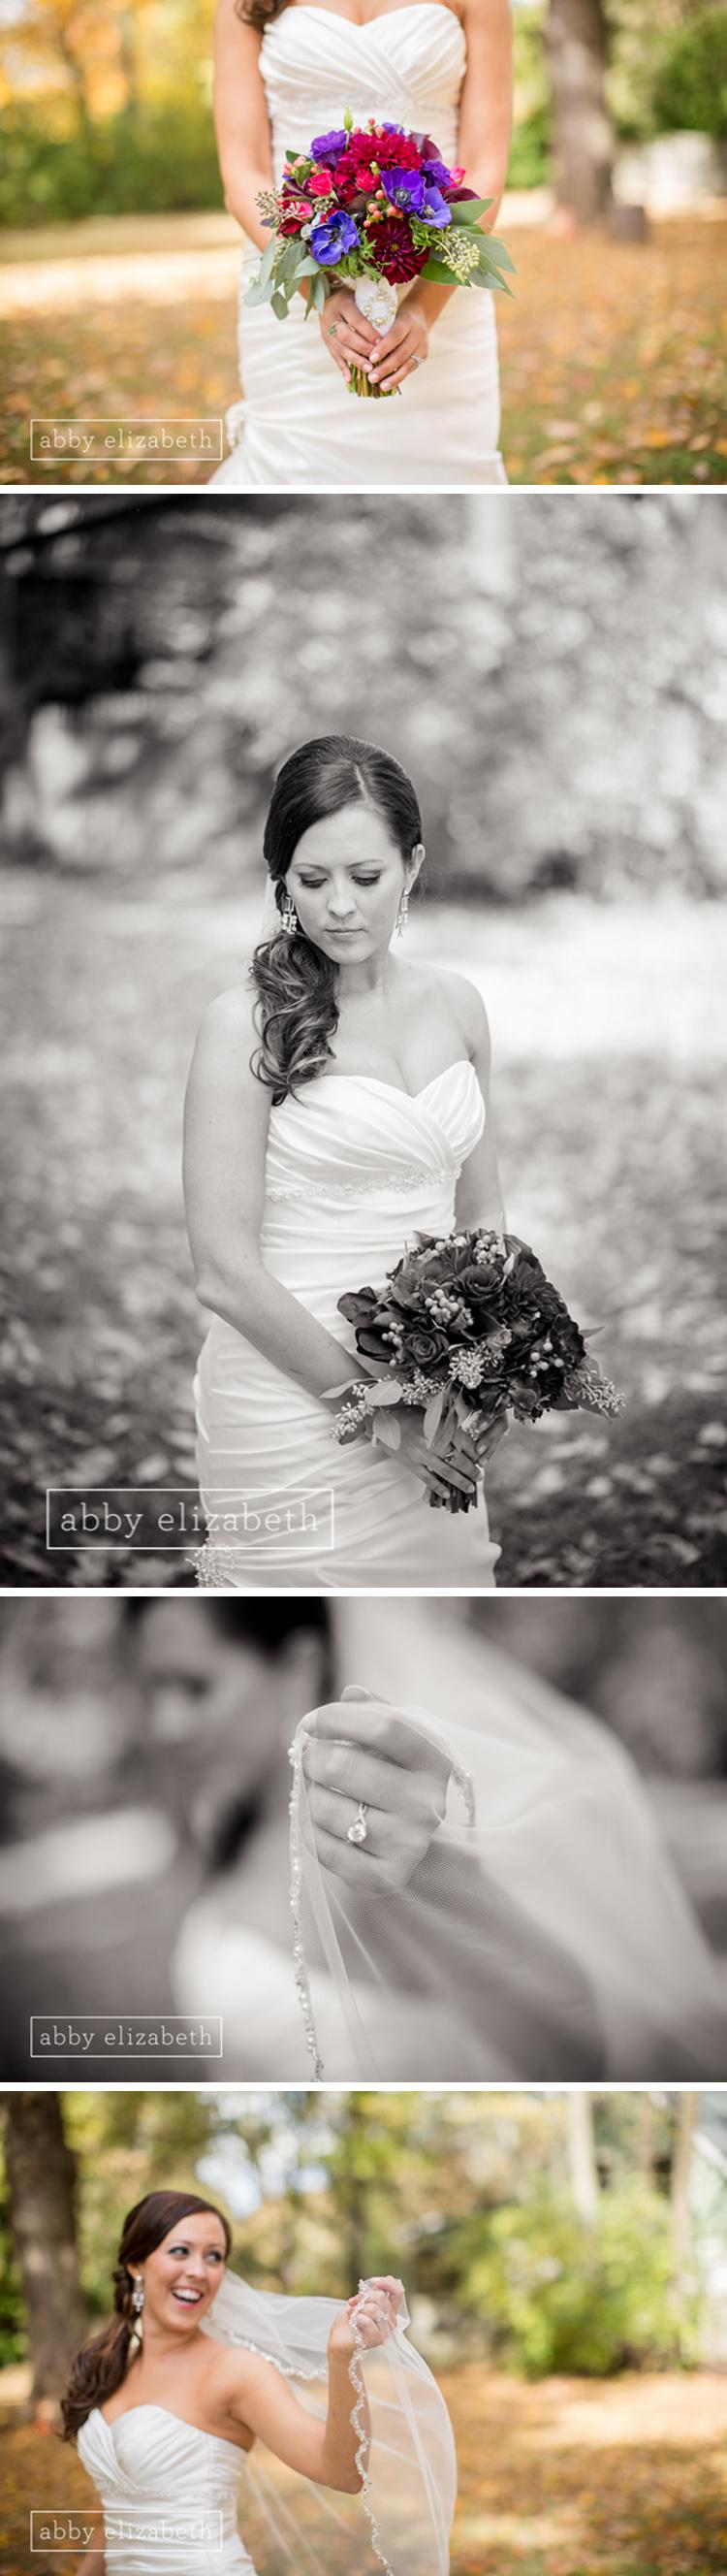 Fall_Wedding_Knoxville_TN_12.jpg